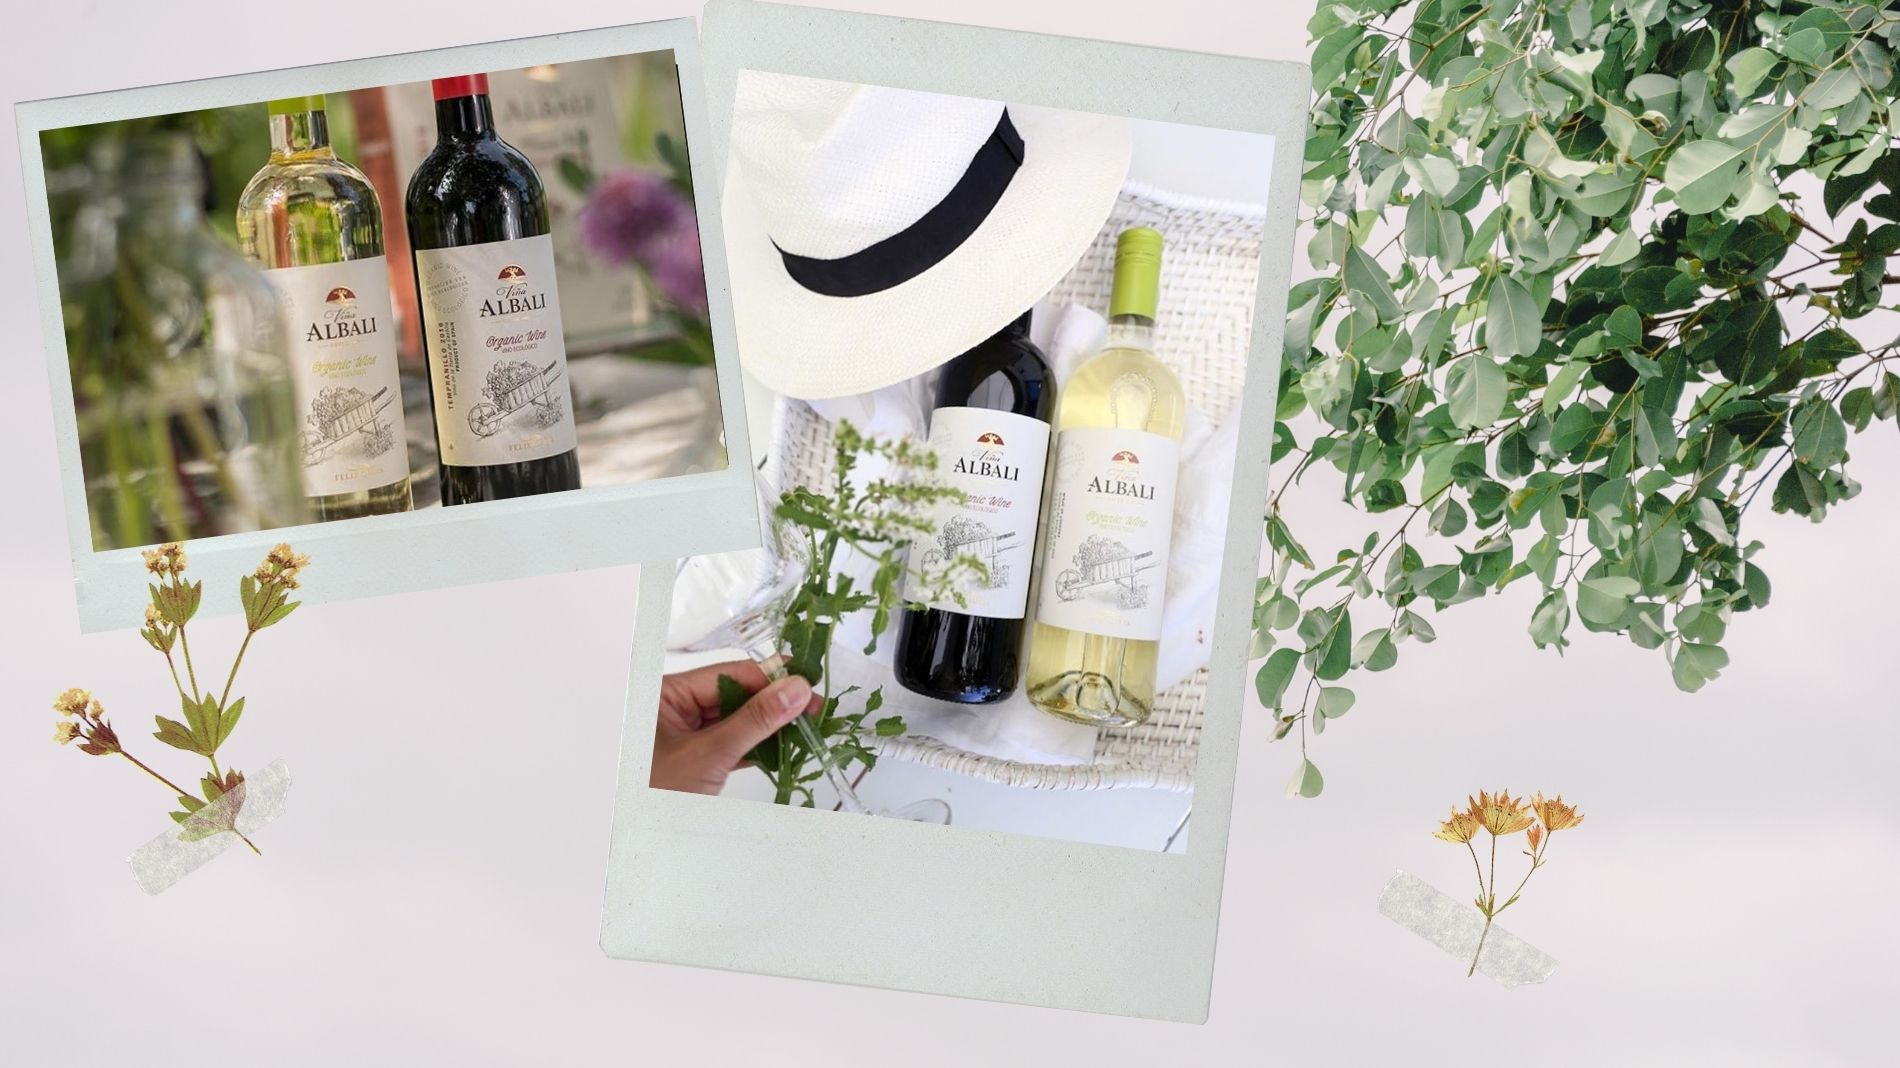 viña albali organics wines